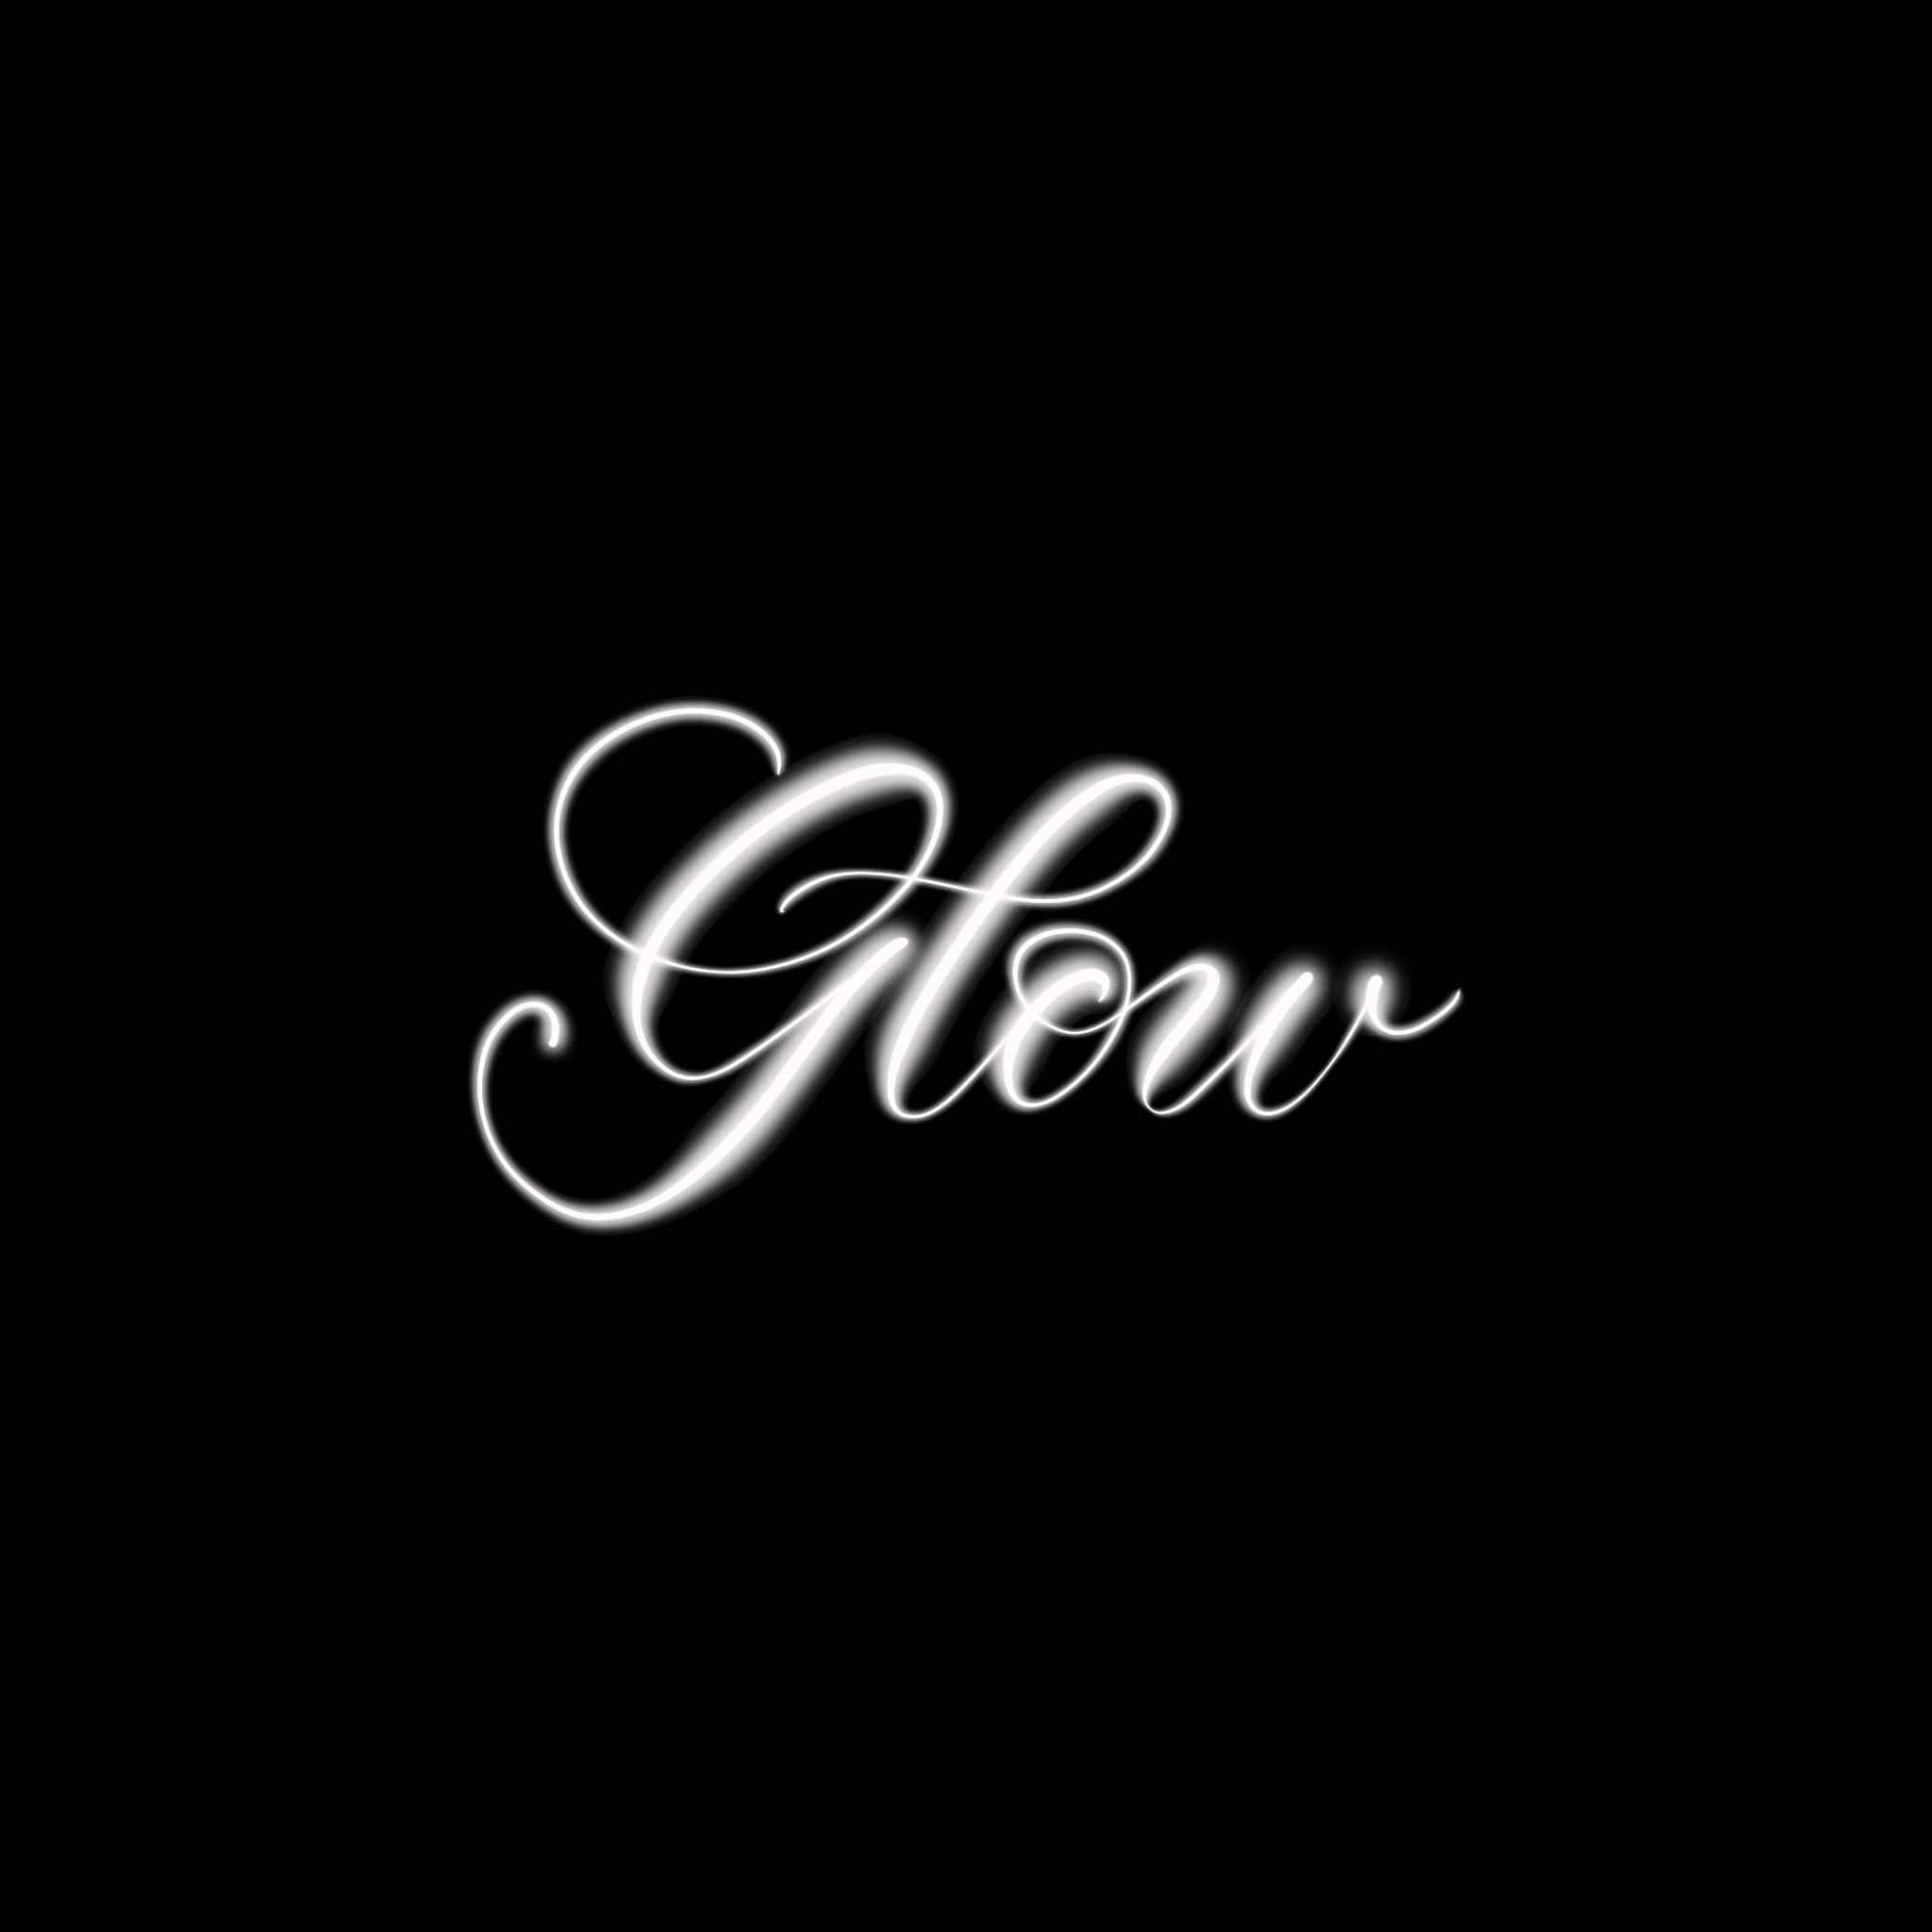 Glow Procreate Lettering Brush - halfapx